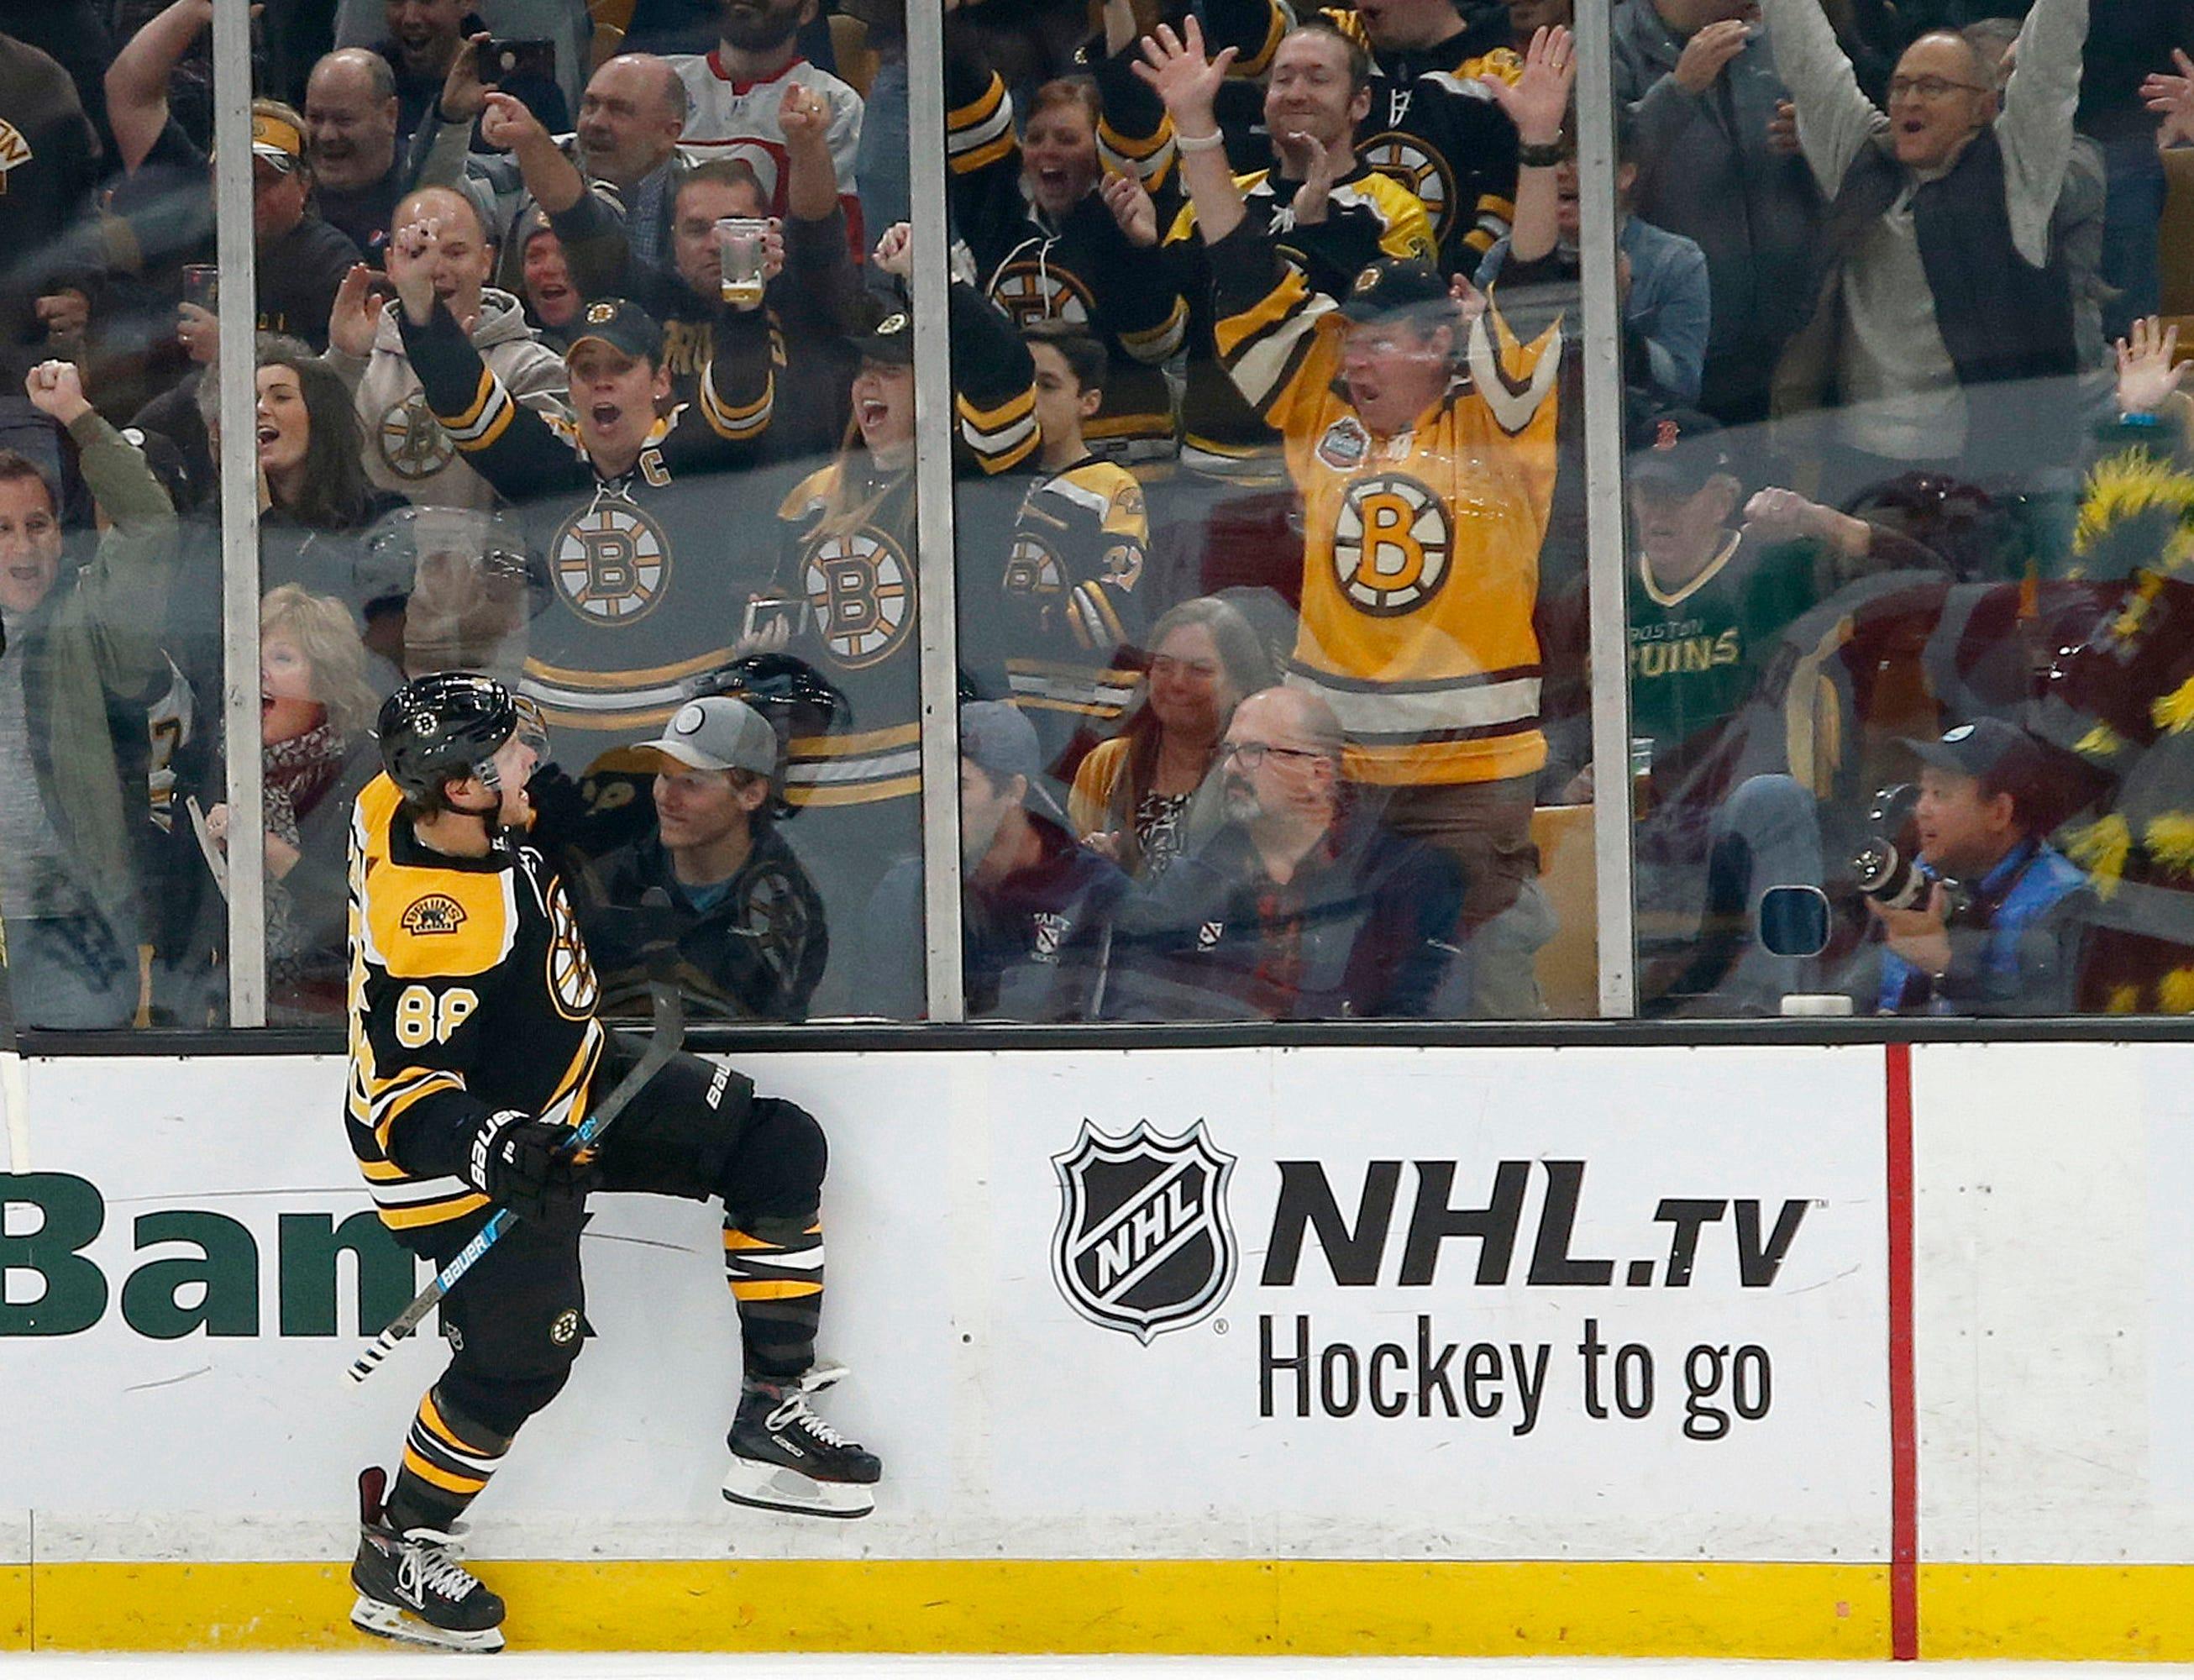 Pastrnak scored 3 goals, Bruins beat winless Red Wings 8-2